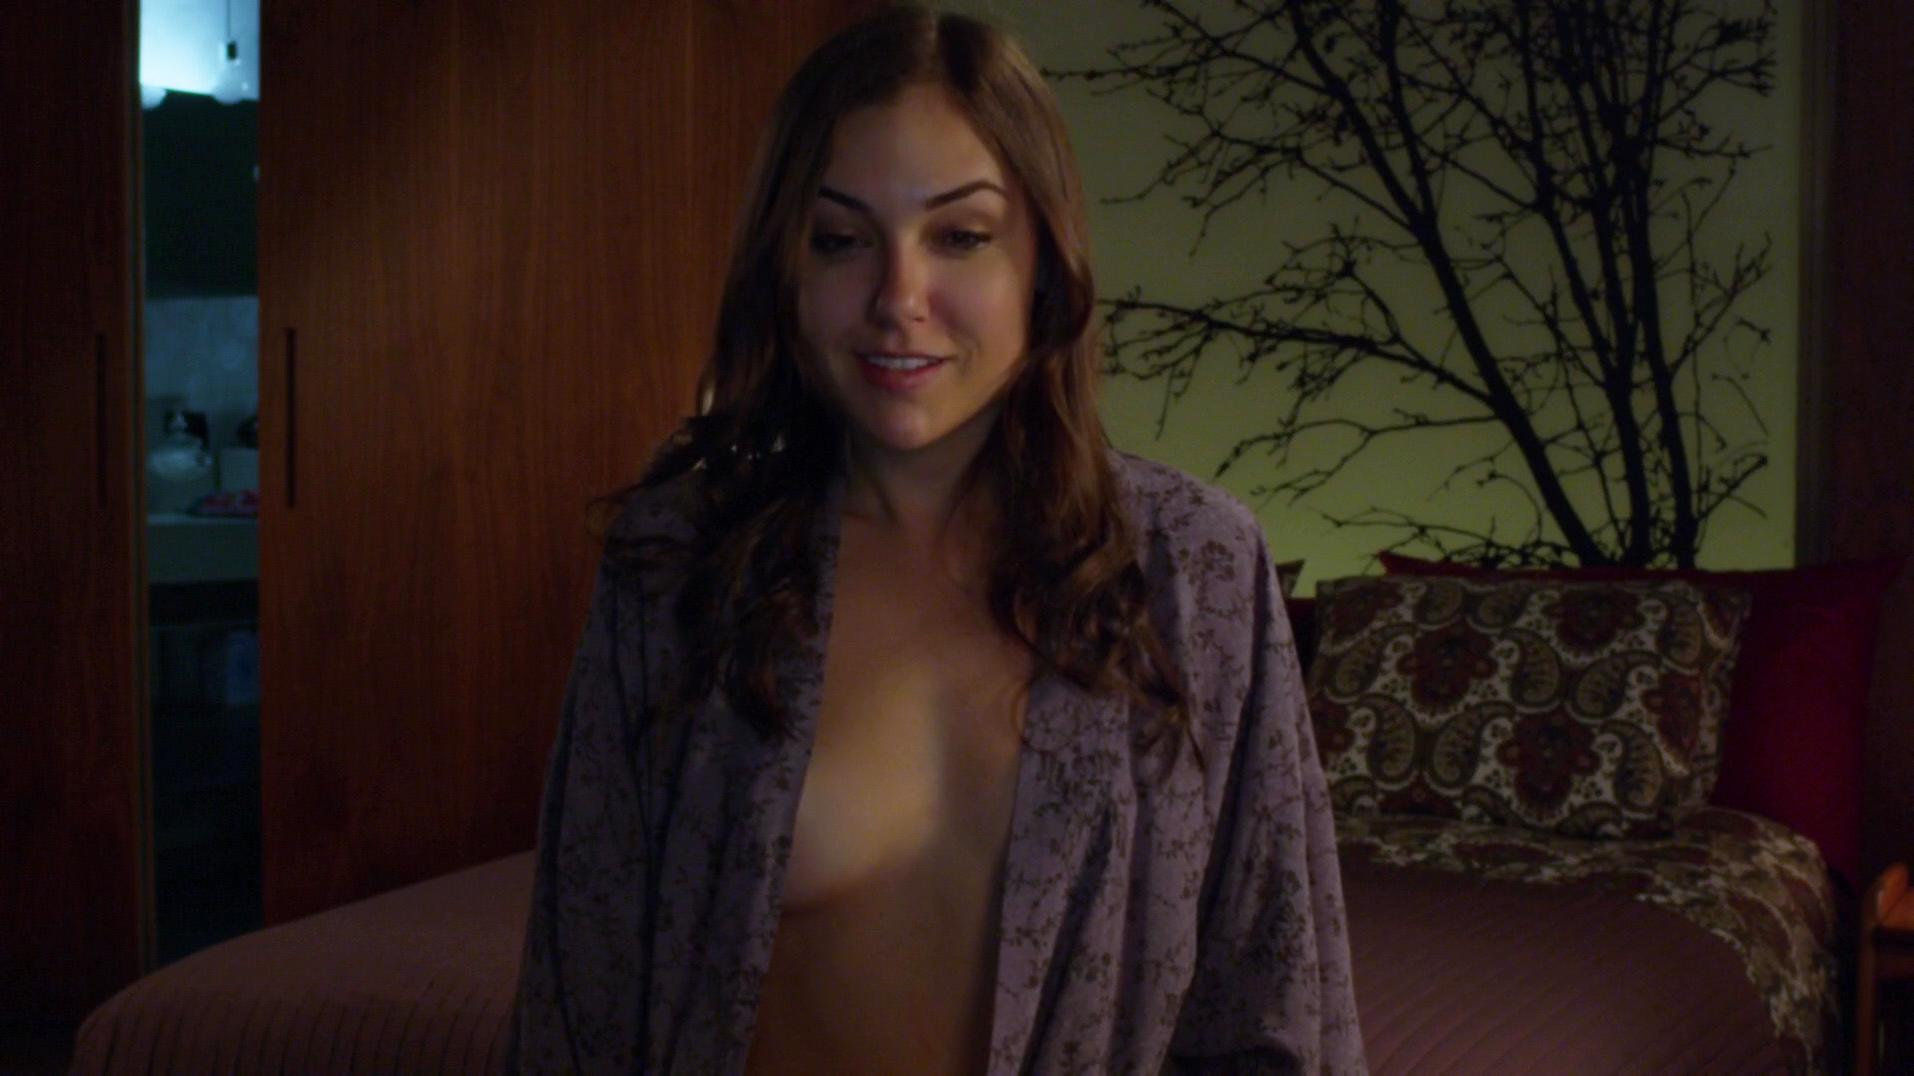 Sasha Grey nude - Open Windows (2014)